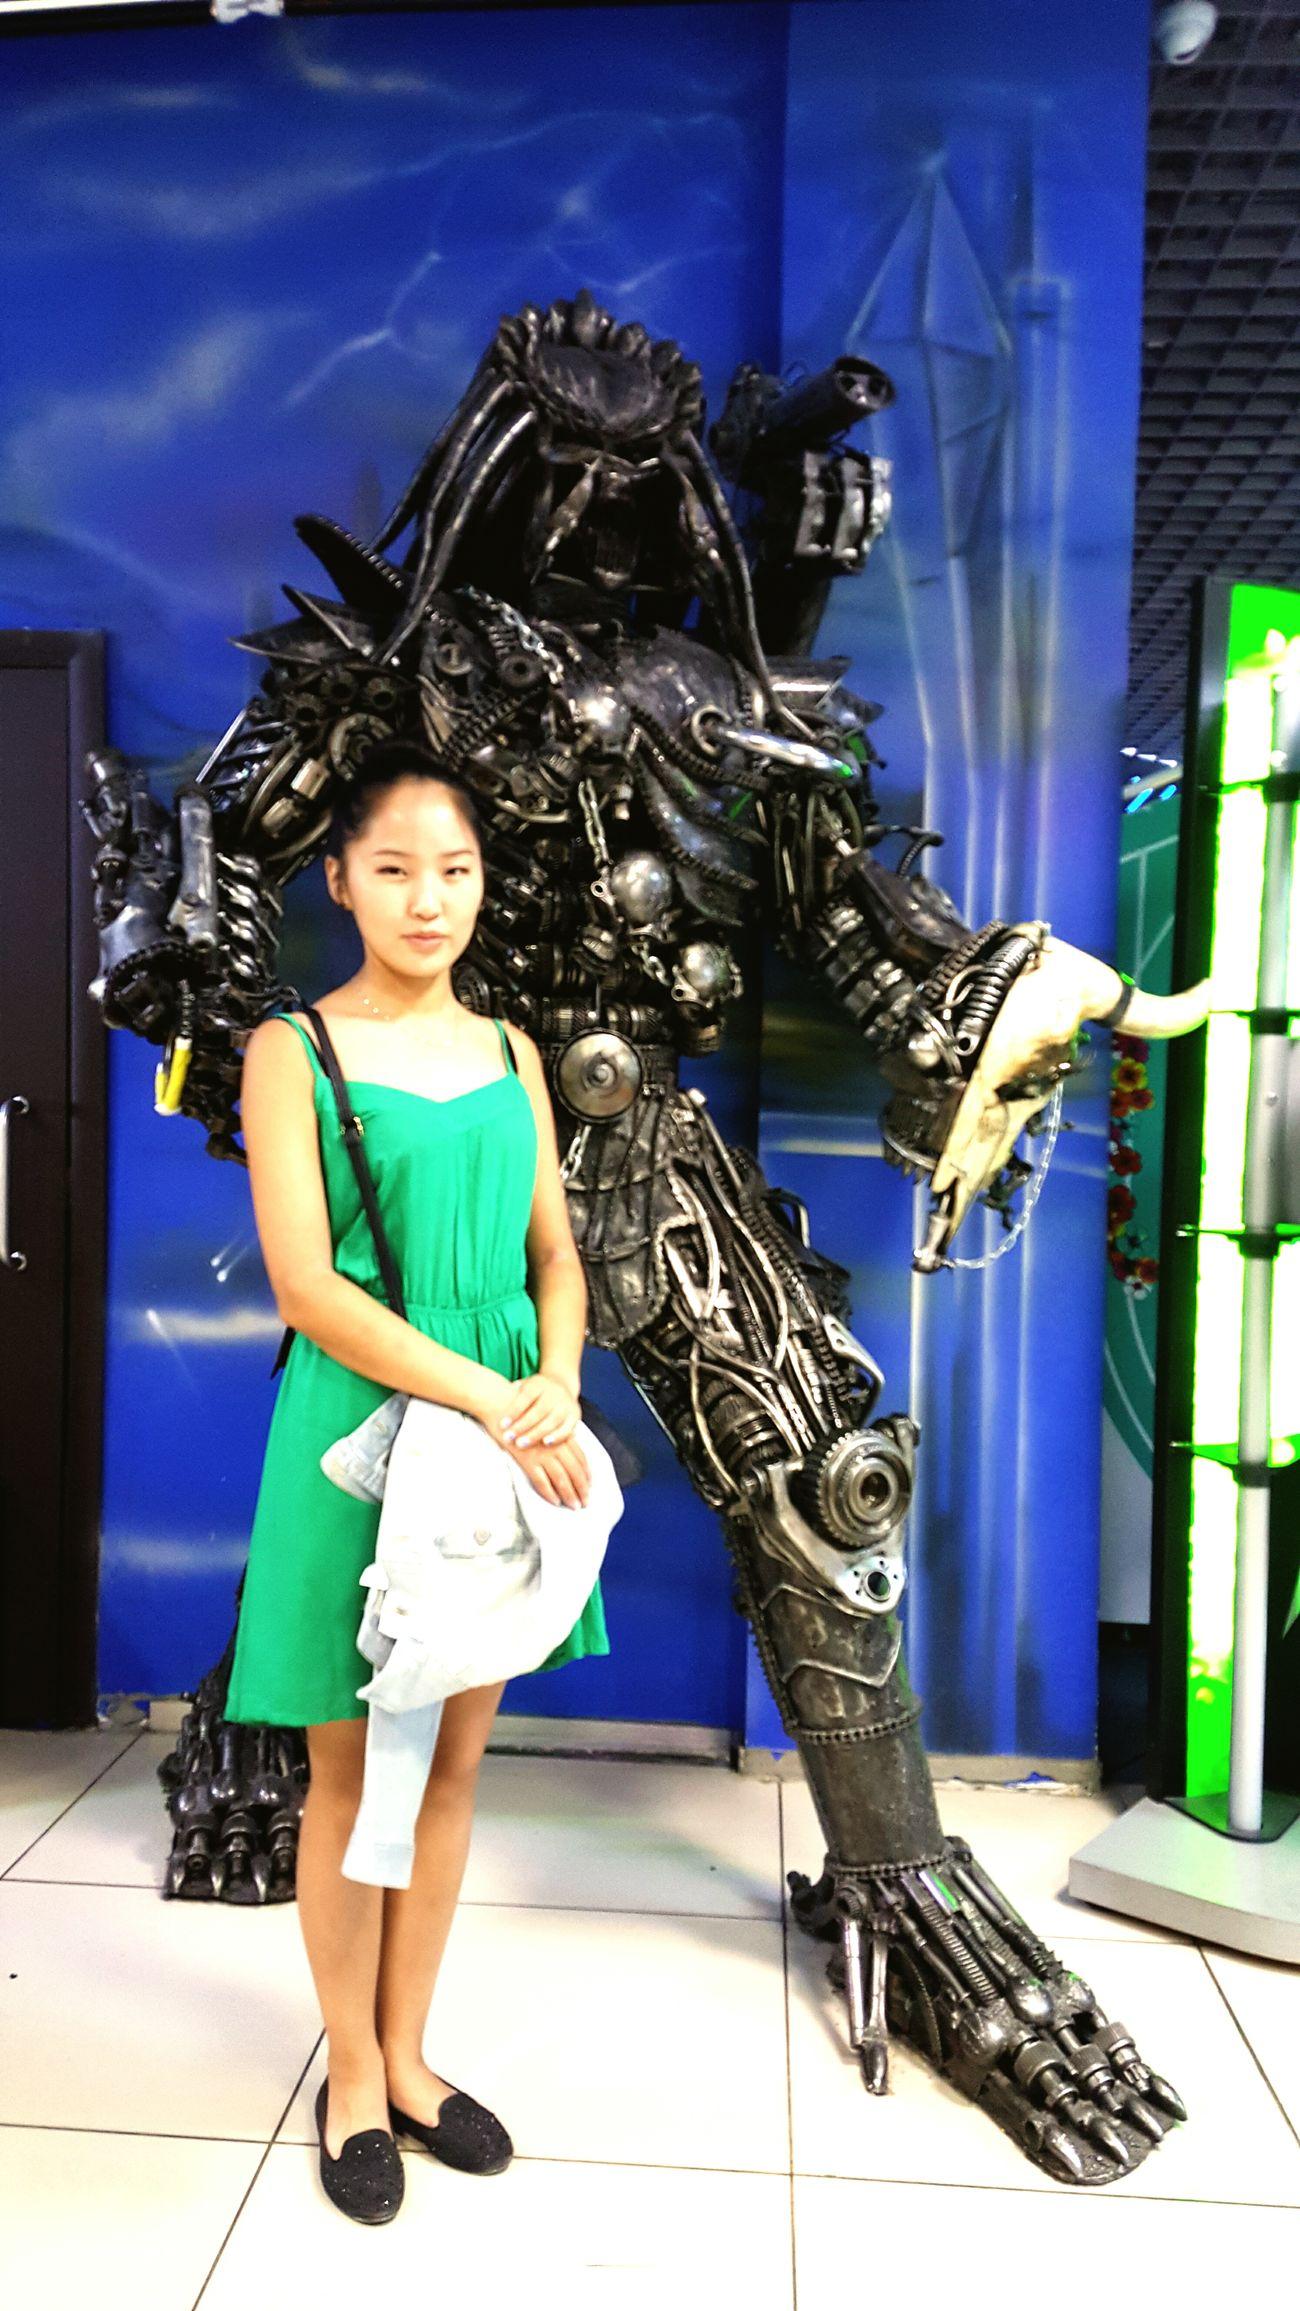 Asian Girl Yakutsk Alian -_- Me бэхискэй индинда саха кыыhа😅😉